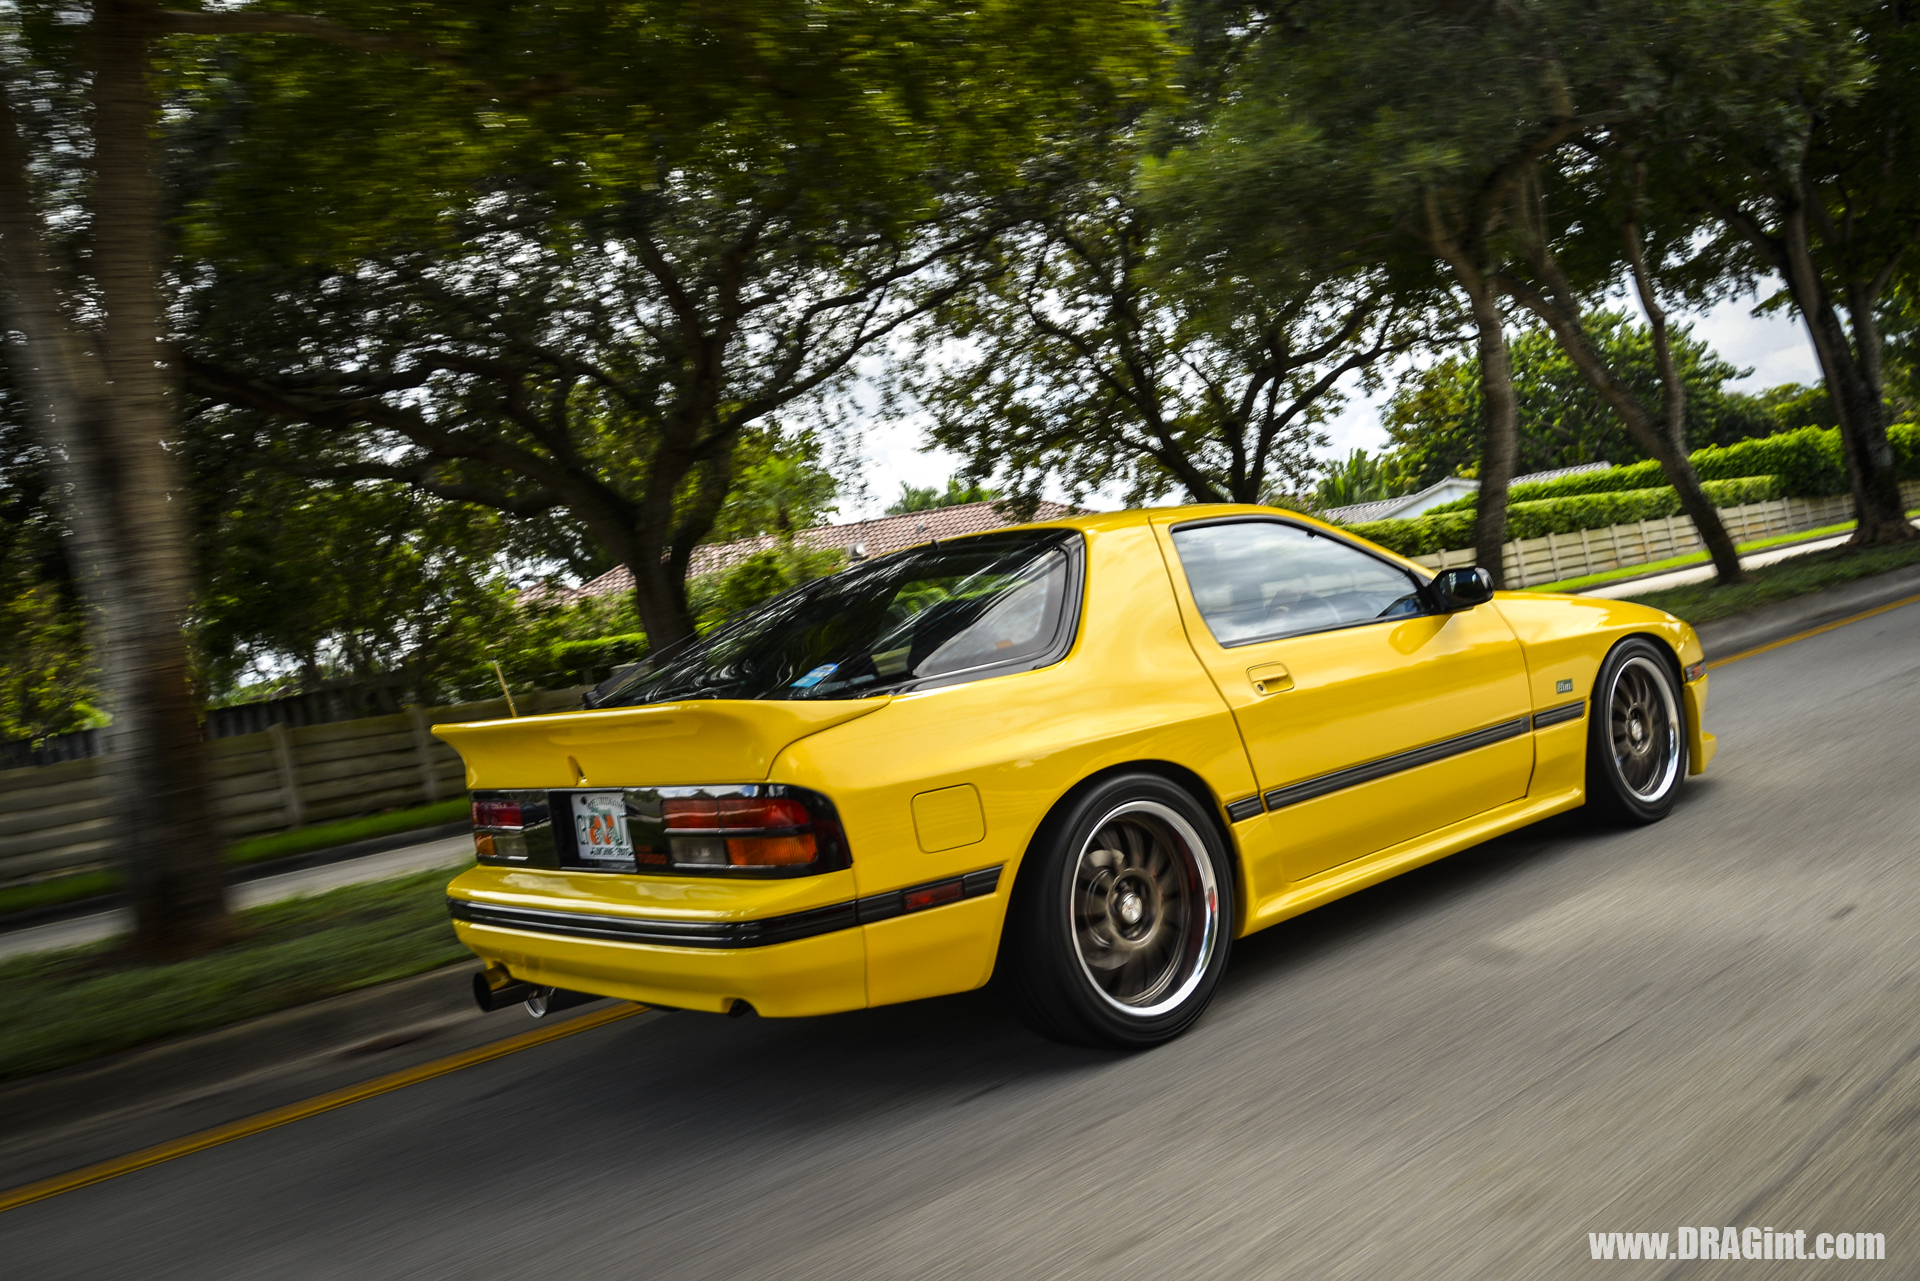 JDM Import 88 Mazda RX7 Turbo 2  Minty Early FC3S Goodness